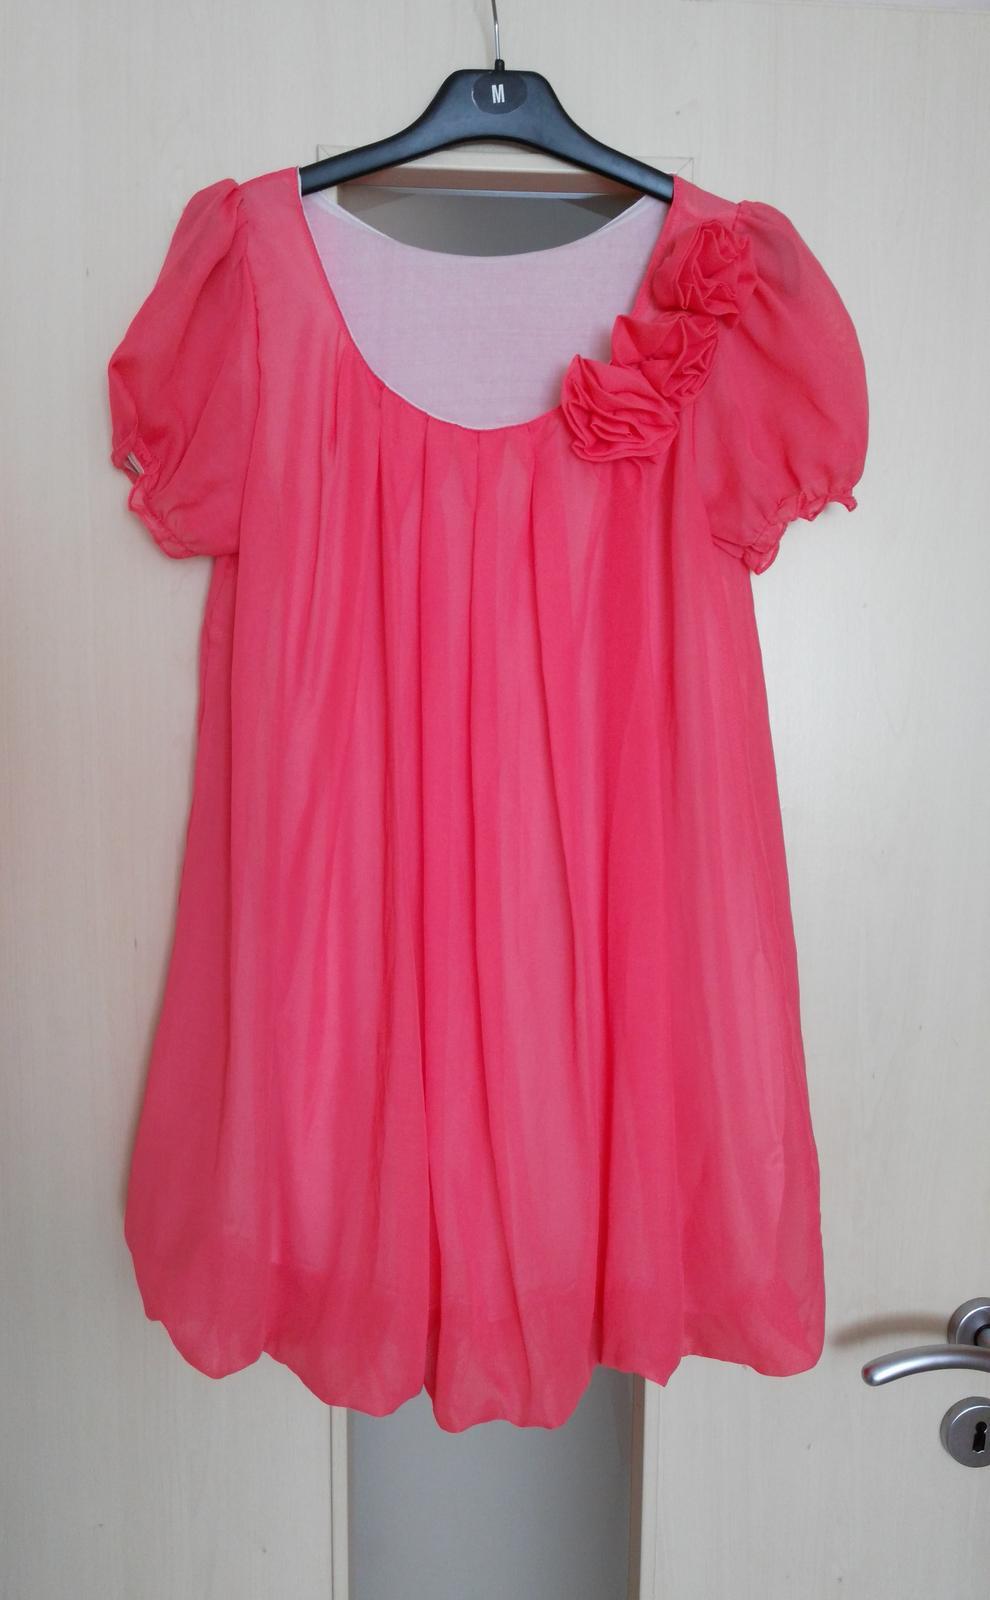 Lososové šifónové šaty 36-38 (S-M) - Obrázok č. 1